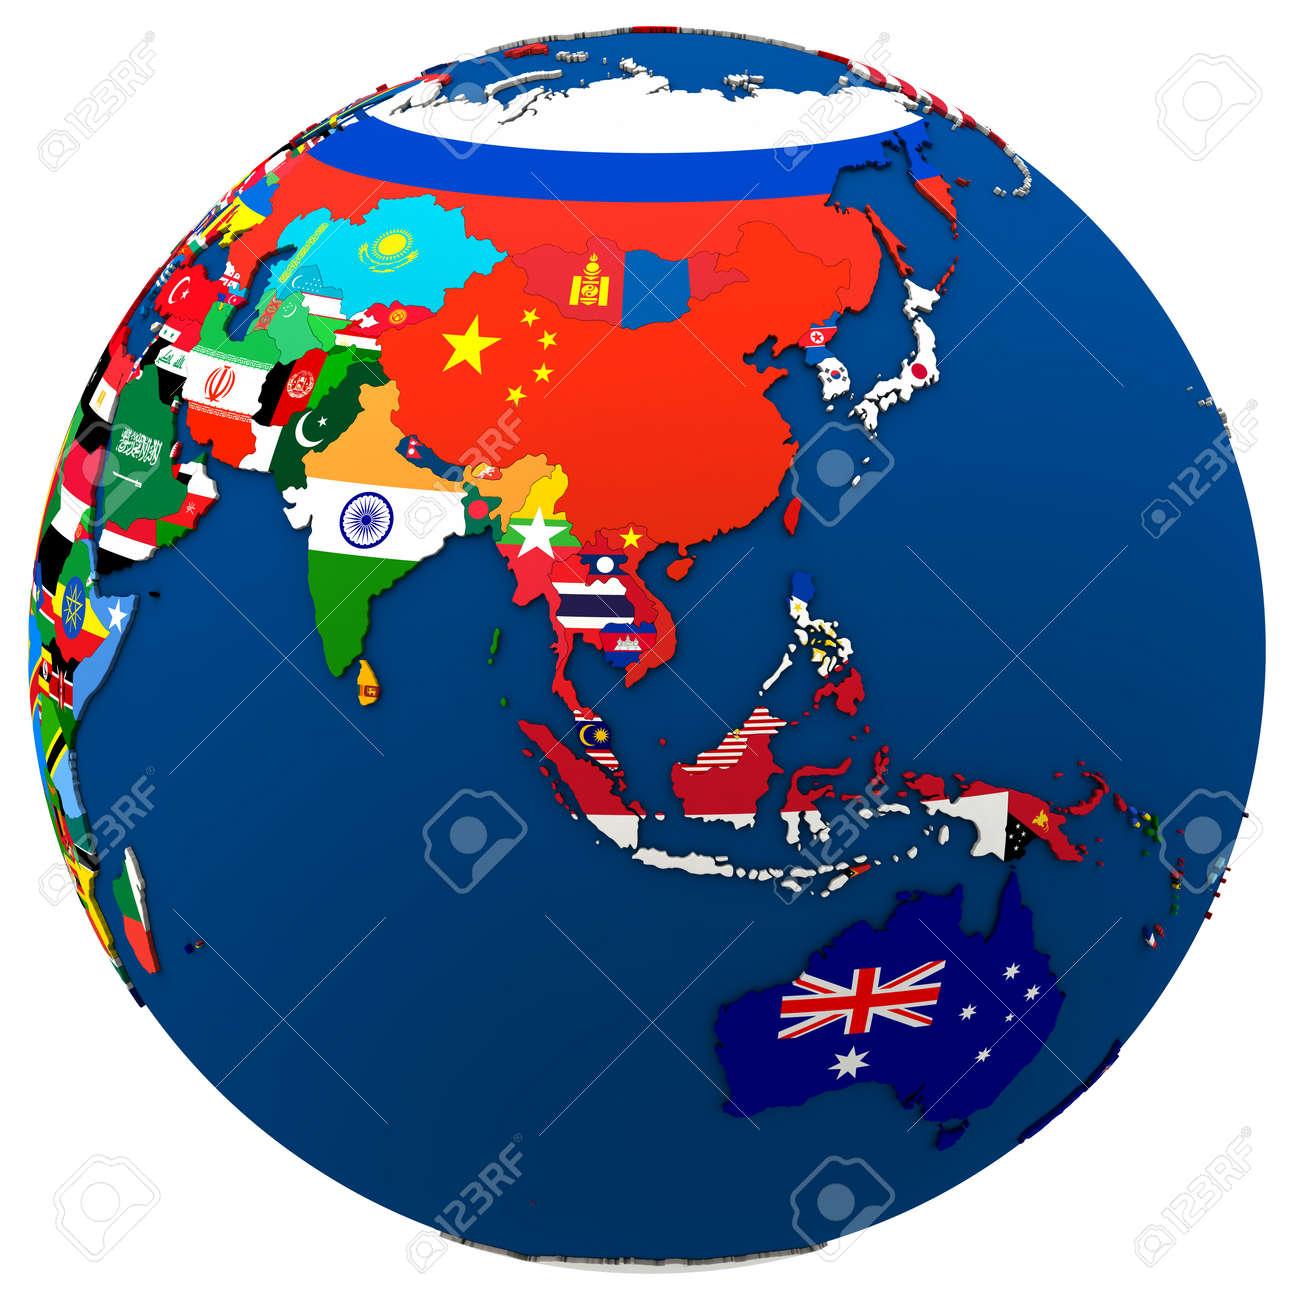 Map Of Australia And Se Asia.Stock Illustration